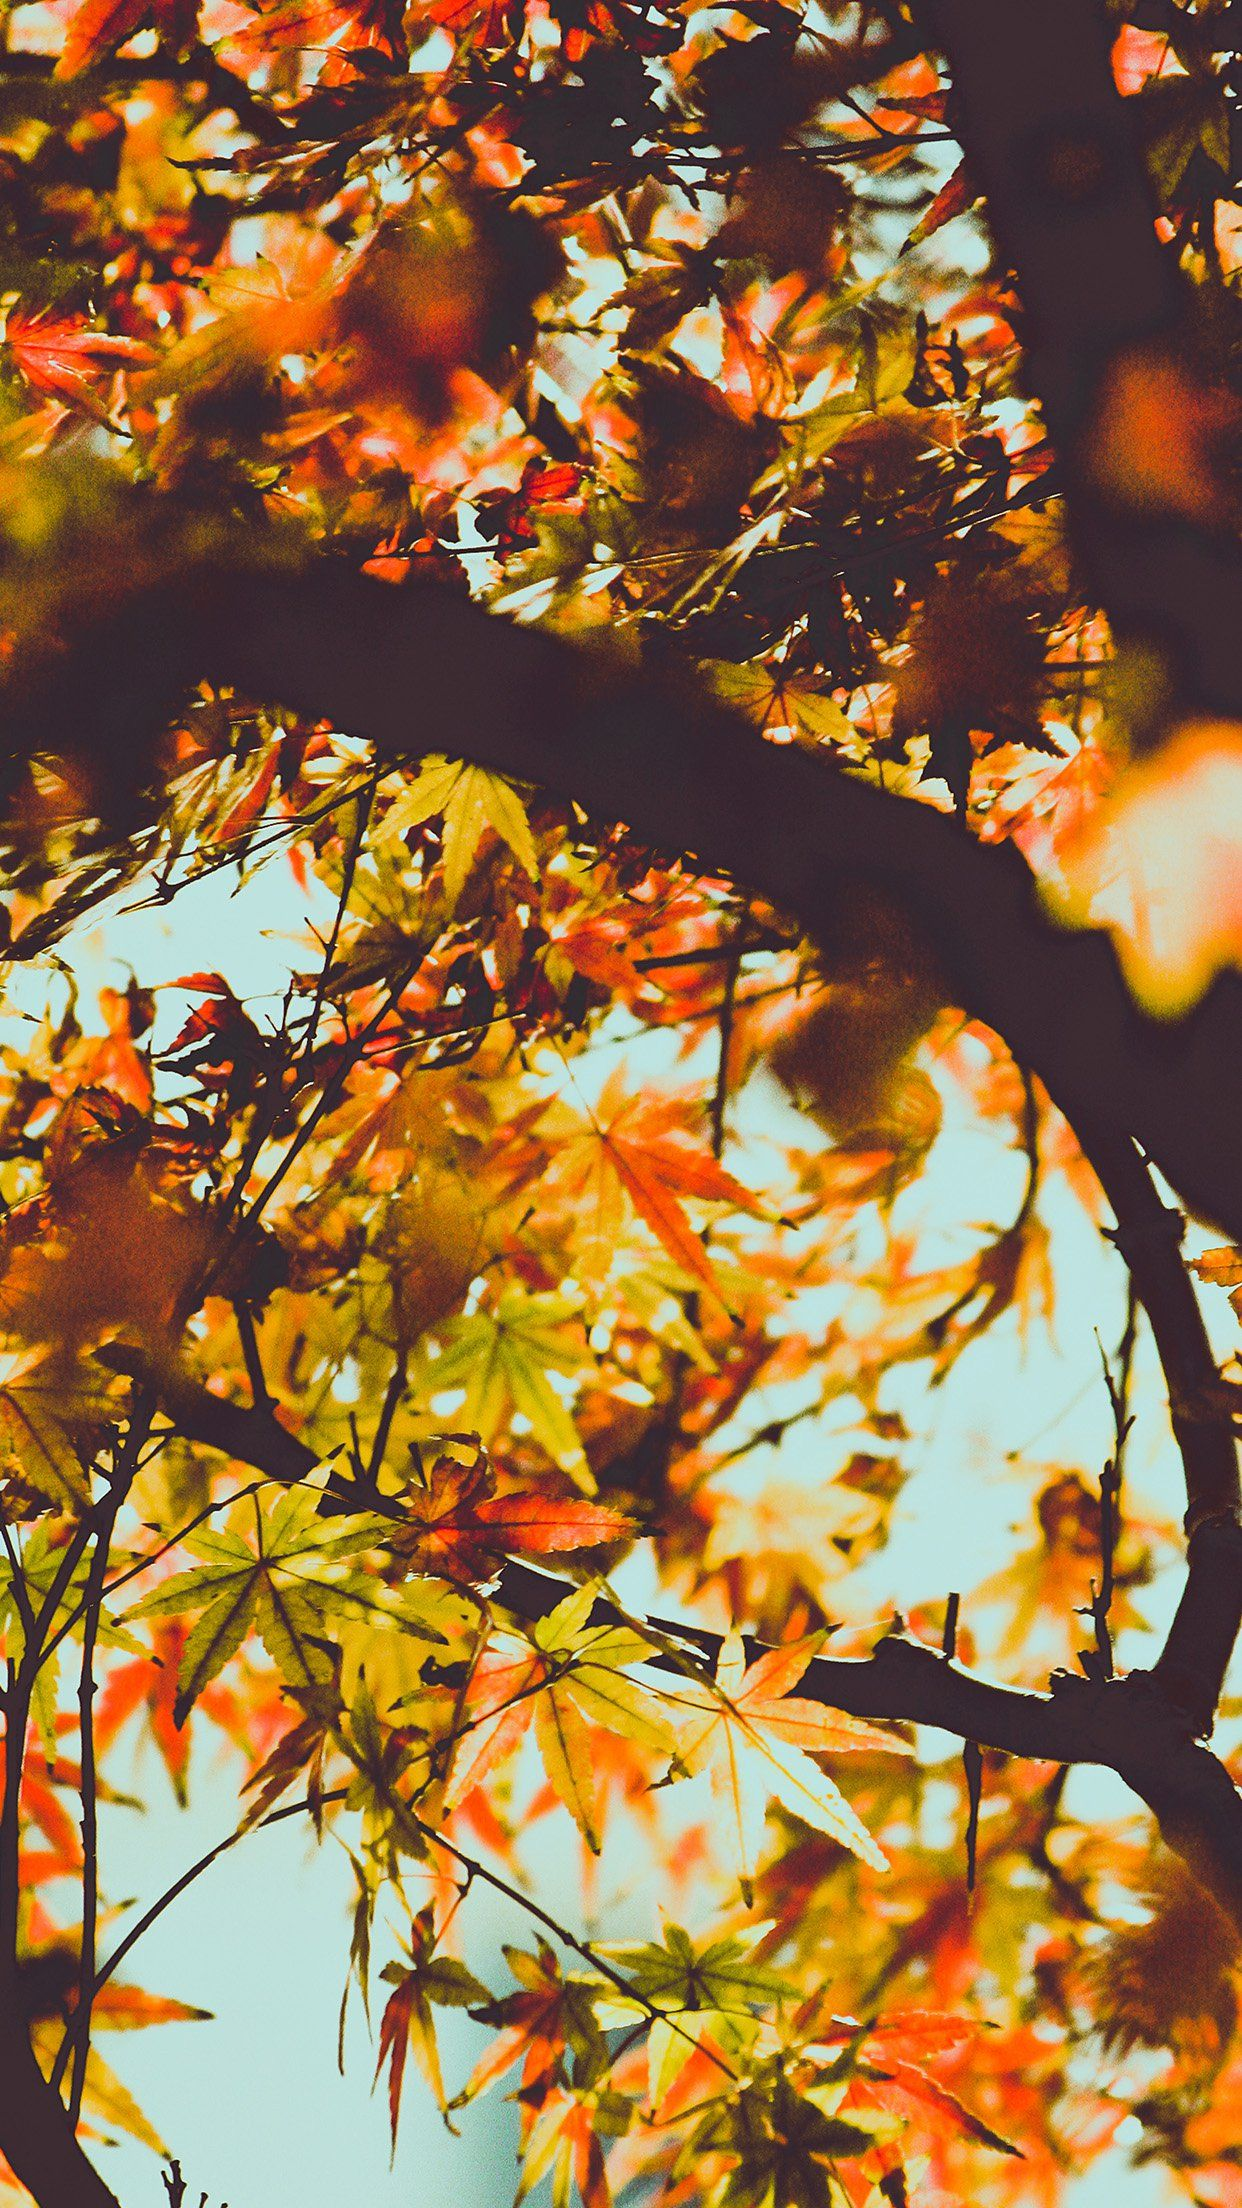 Android Autumn Wallpaper : android, autumn, wallpaper, Autumn, Android, Wallpapers, Wallpaper